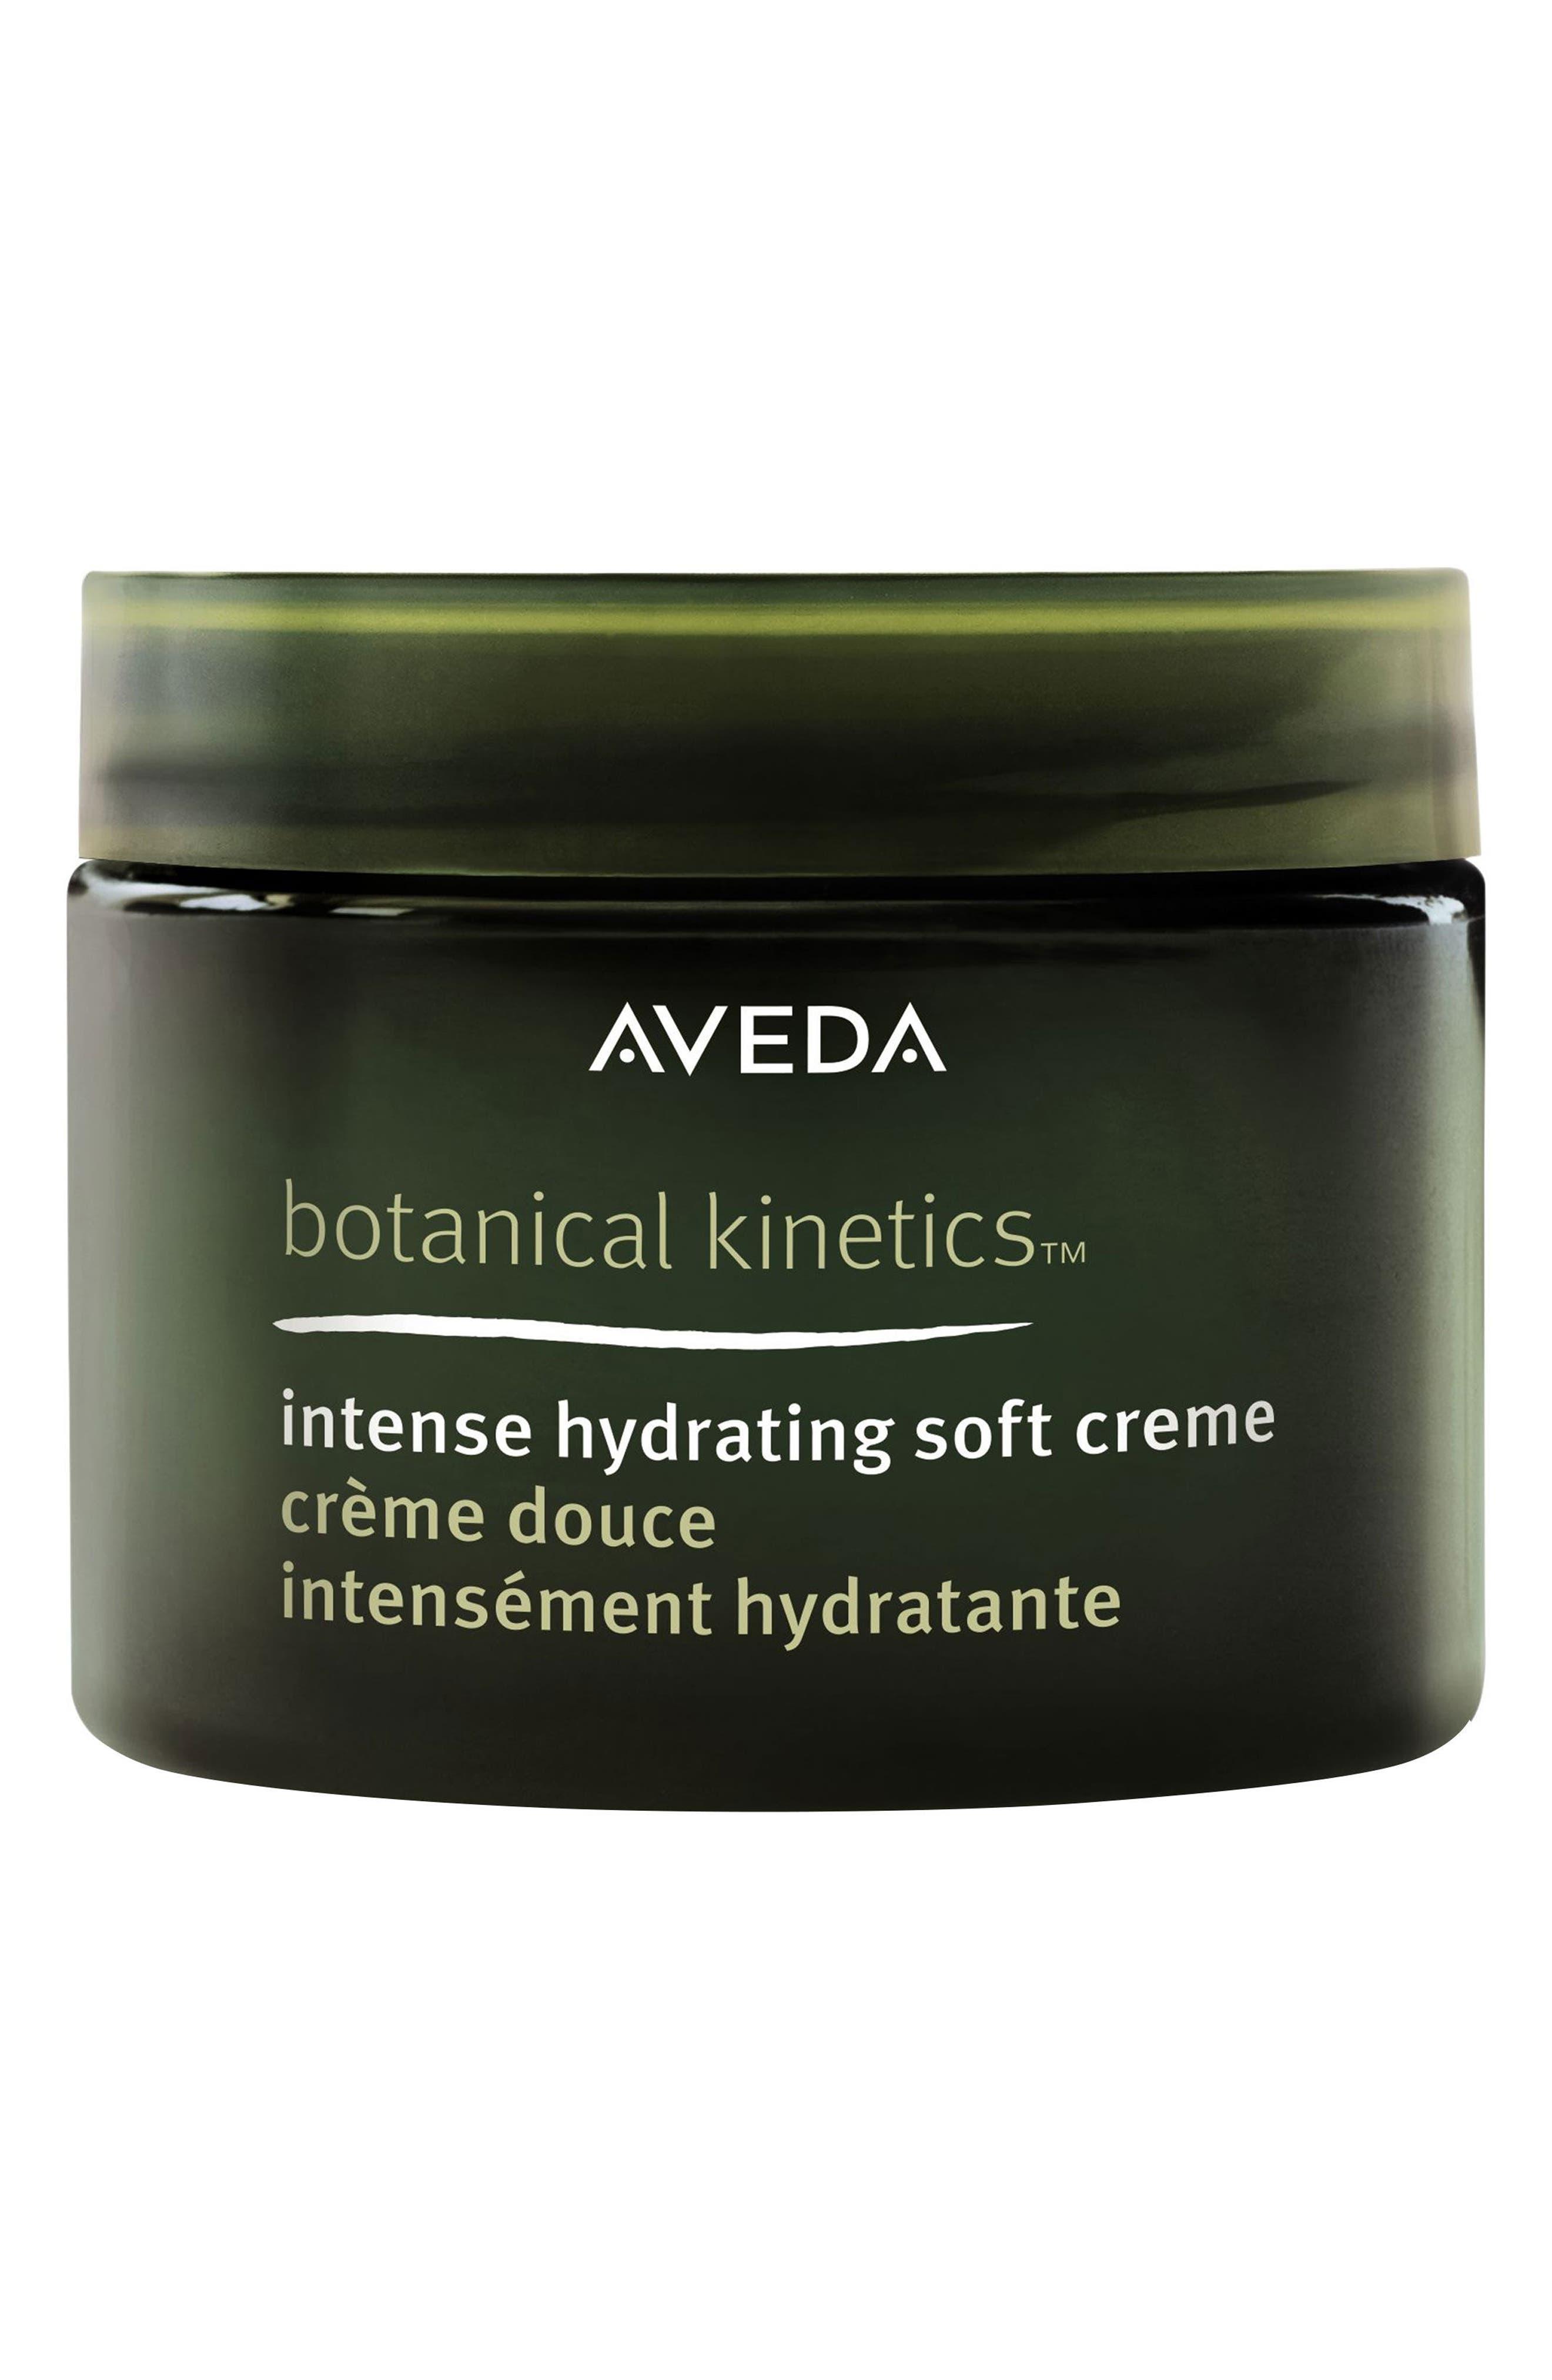 Alternate Image 1 Selected - Aveda 'botanical kinetics™' Intense Hydrating Soft Crème